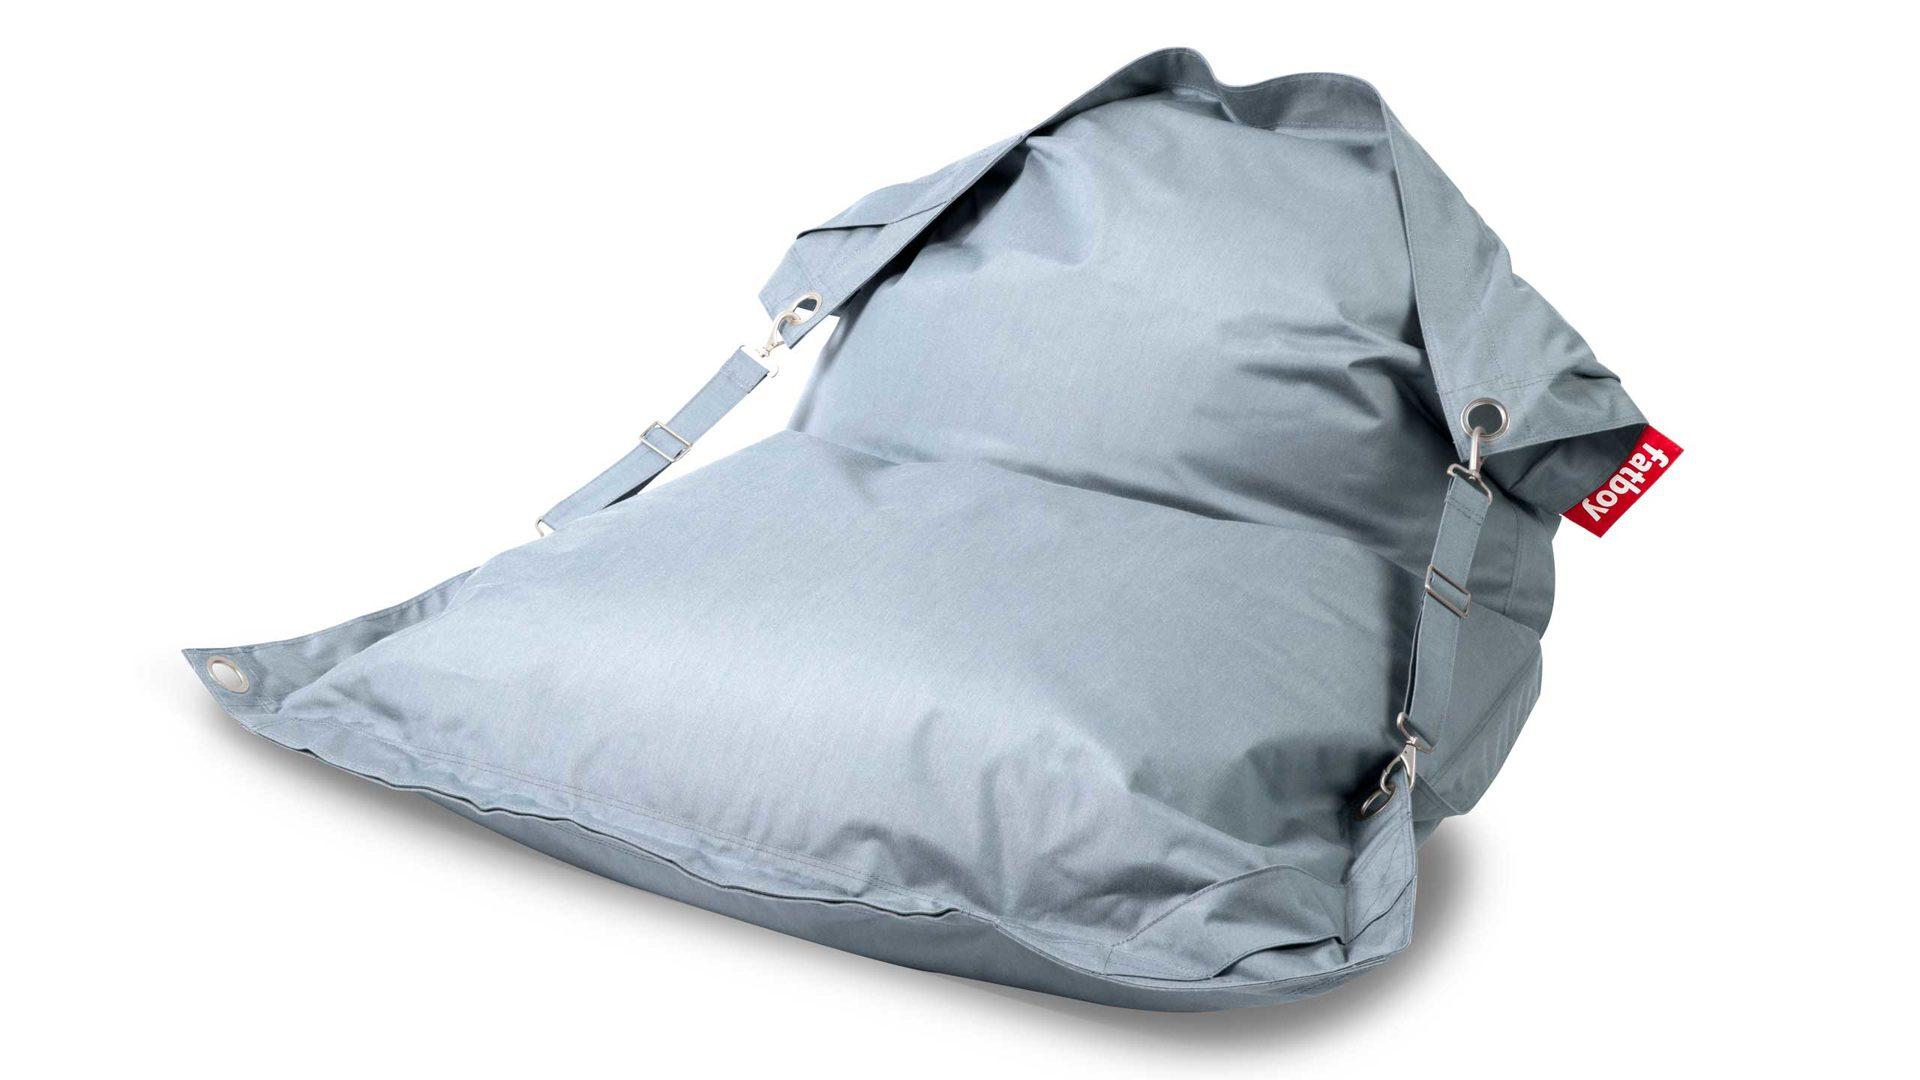 Fatboy Sitzsack Original Outdoor Charcoal Anthrazit 180 X 140 Cm